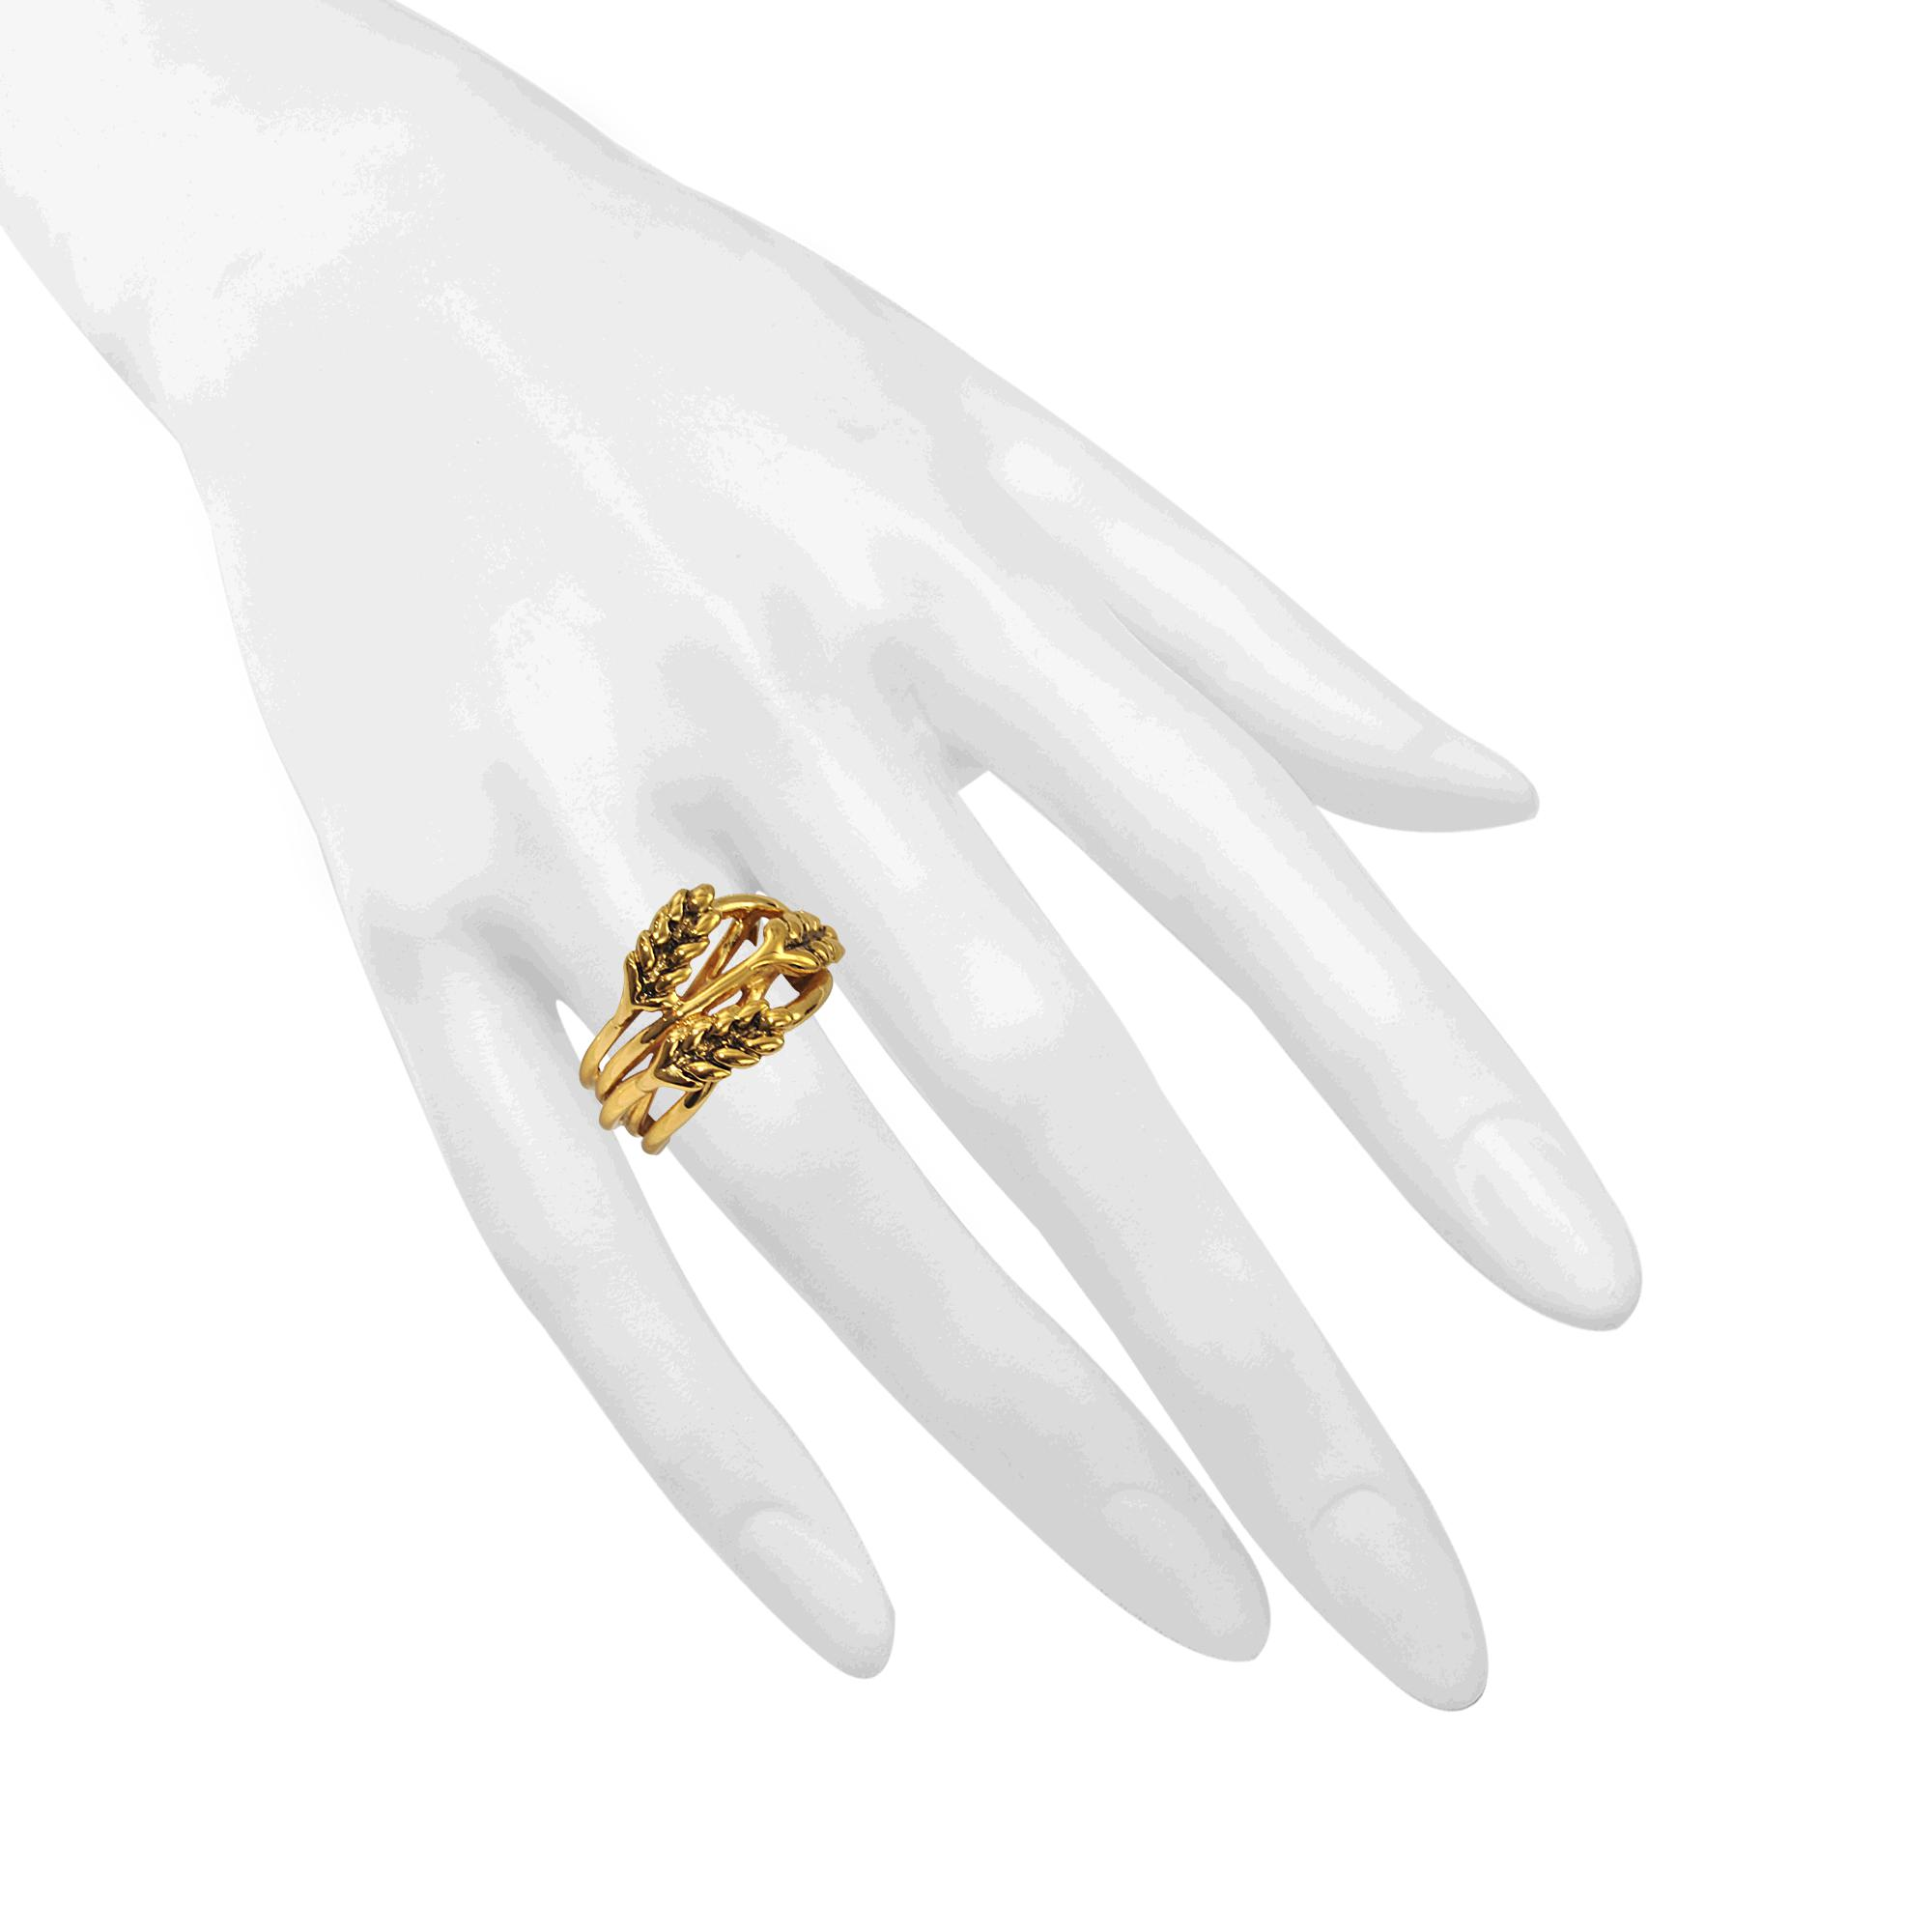 Large Wheat Ring in 18K Gold-Plated Brass Aurélie Bidermann RqhTzr3YU